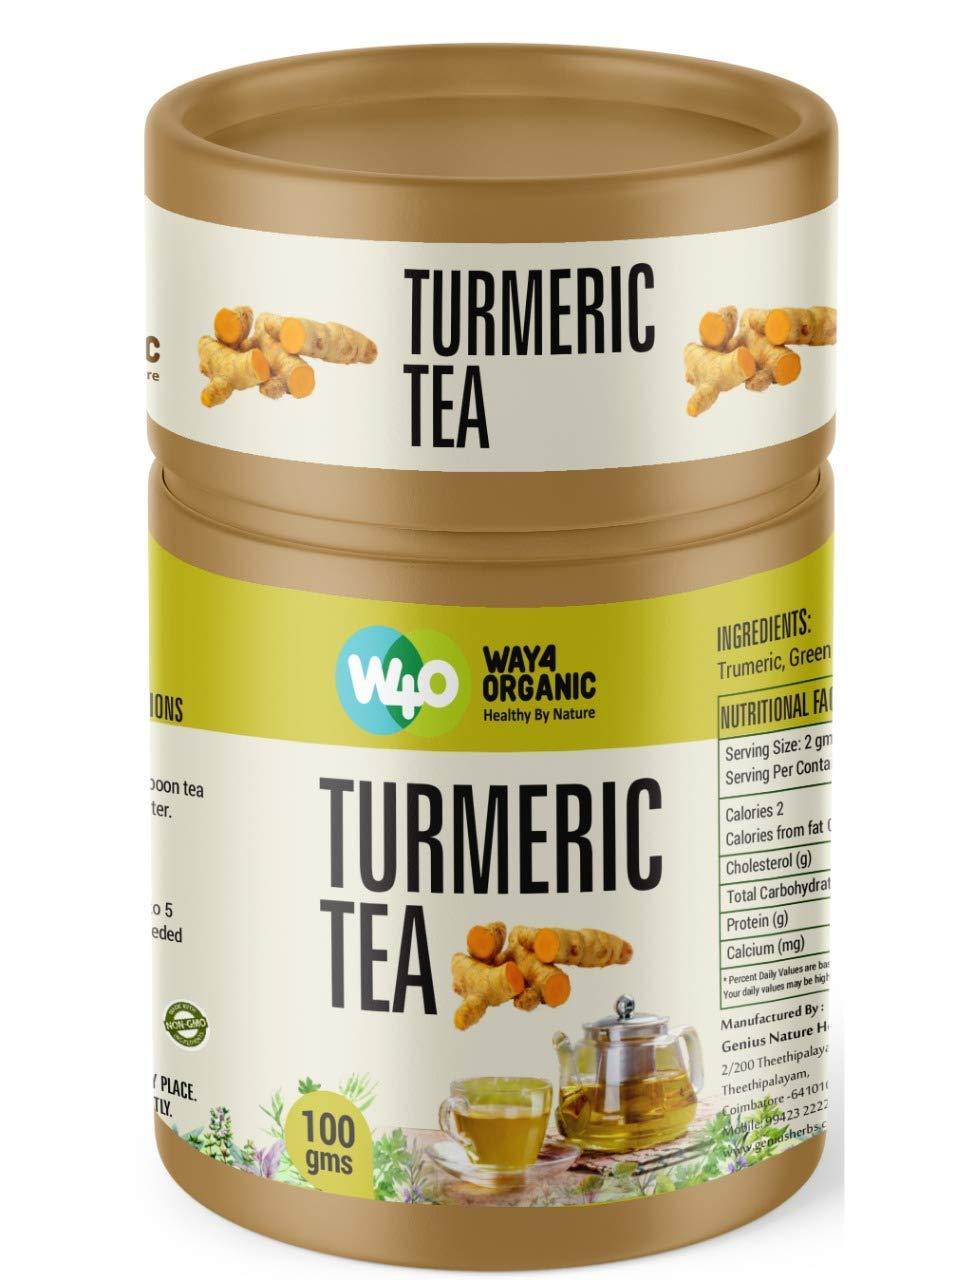 Way4Organic Turmeric Tea